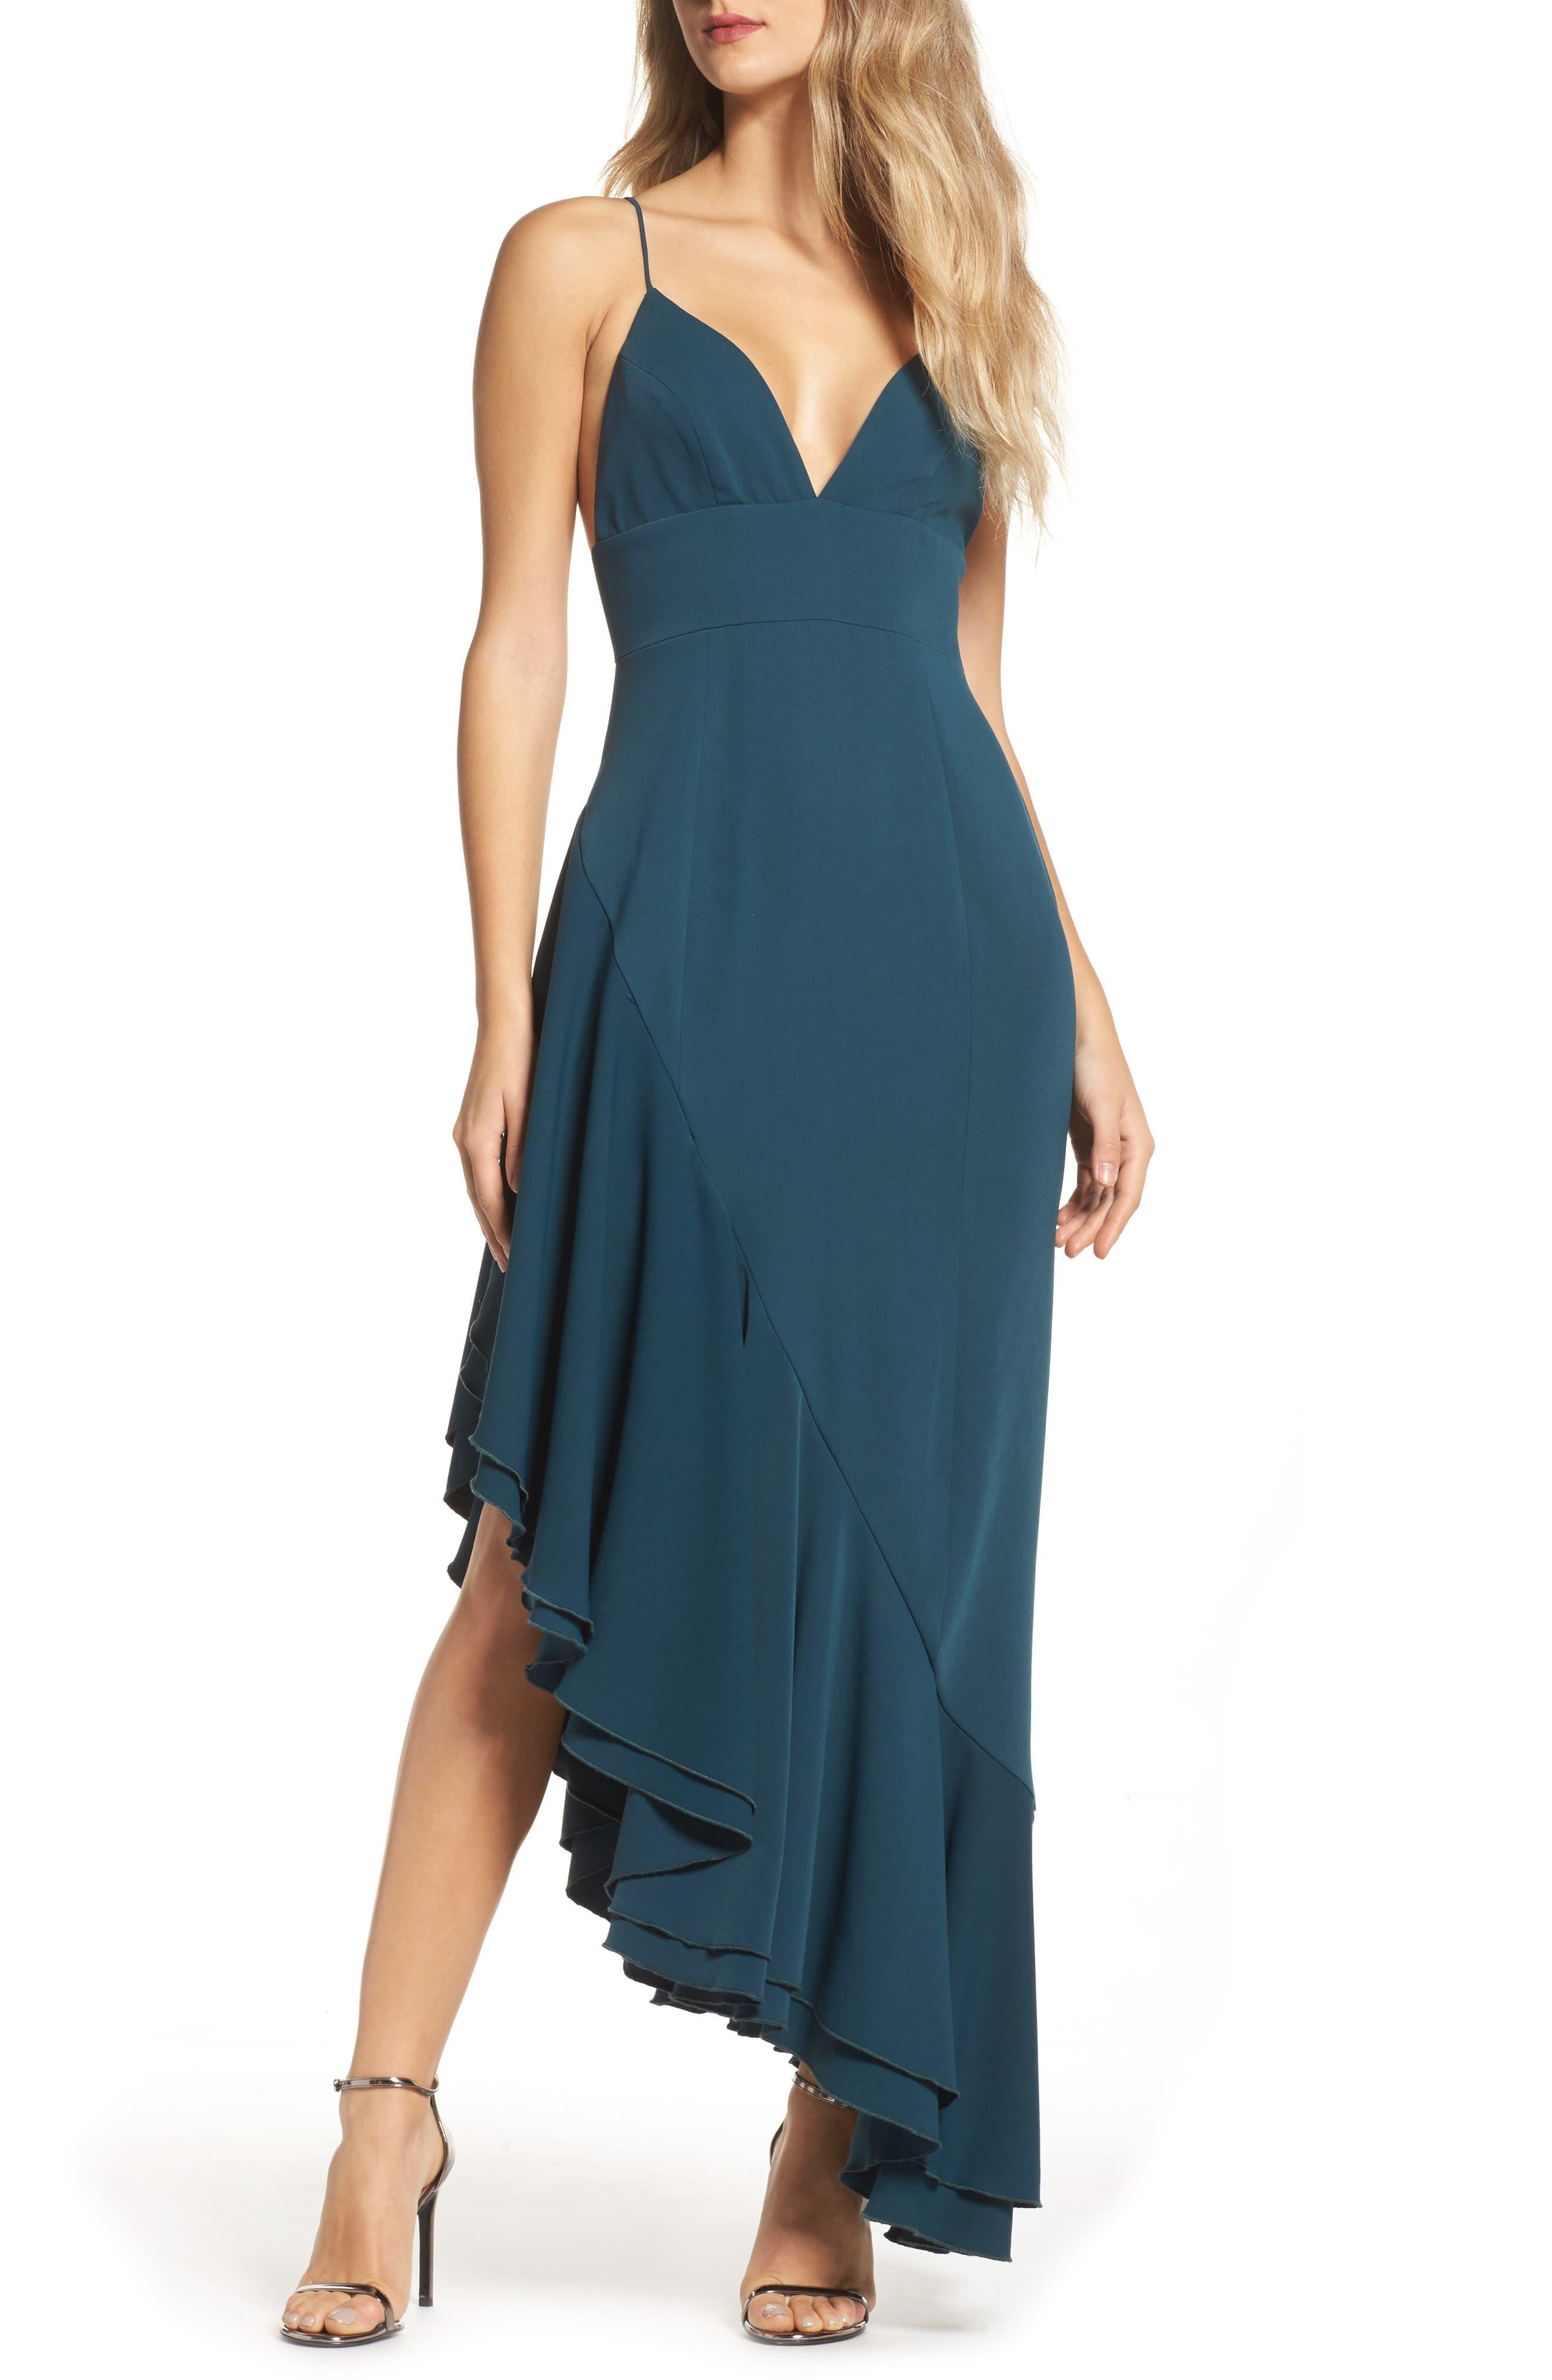 Temptation Asymmetrical Gown,                             Main thumbnail 1, color,                             300